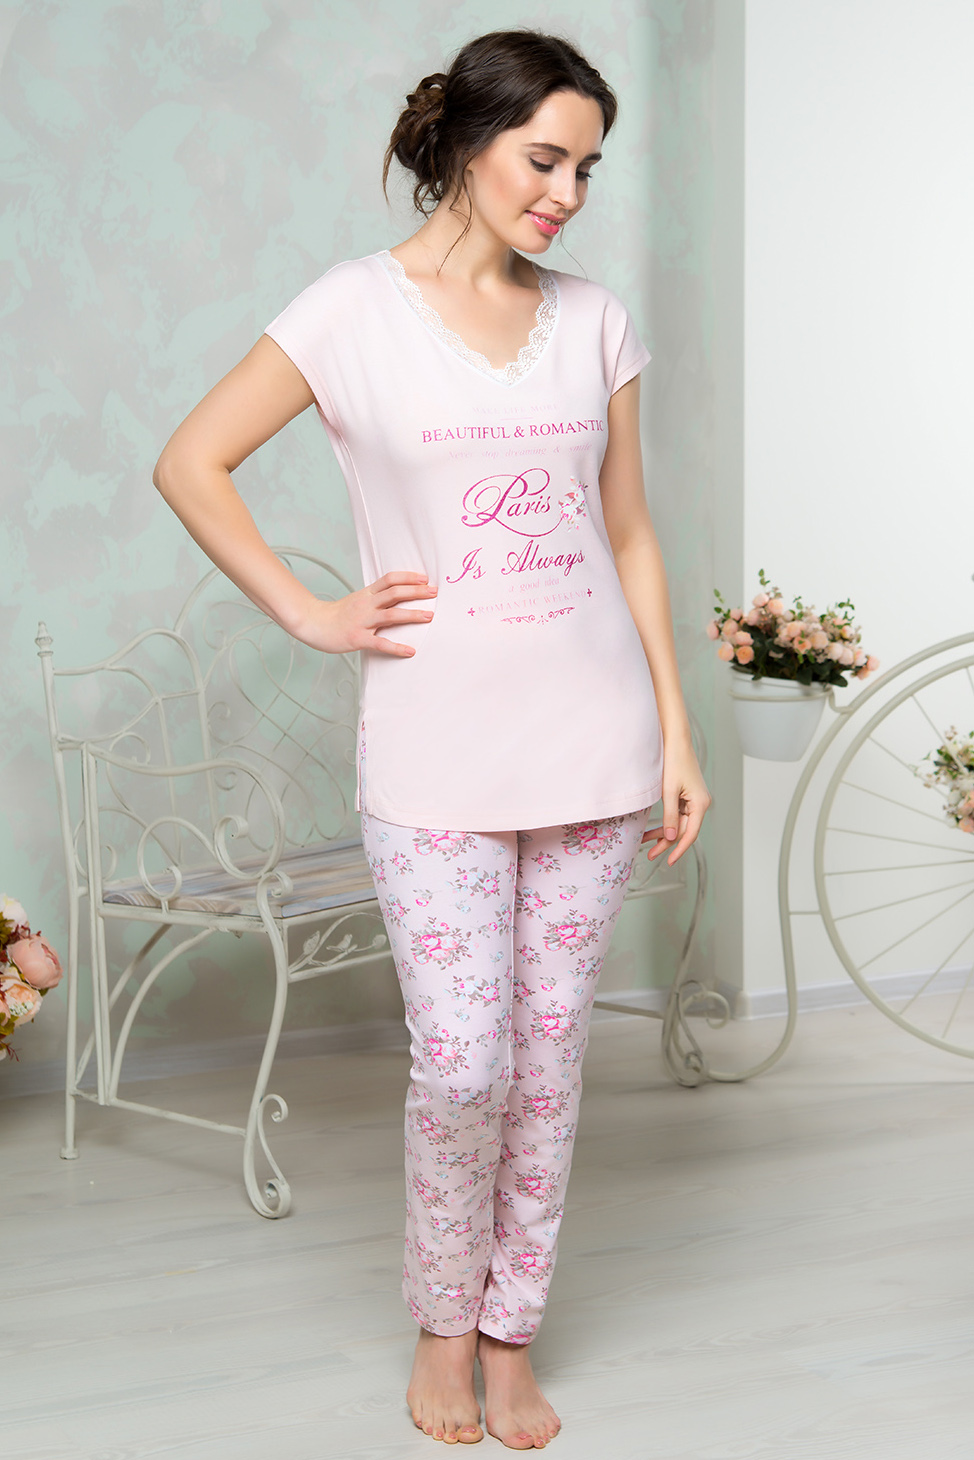 Пижамы Mia Cara Пижама Juliet Цвет: Розовый (xxL) пижама жен mia cara майка шорты botanical aw15 ubl lst 264 р 42 44 1119503